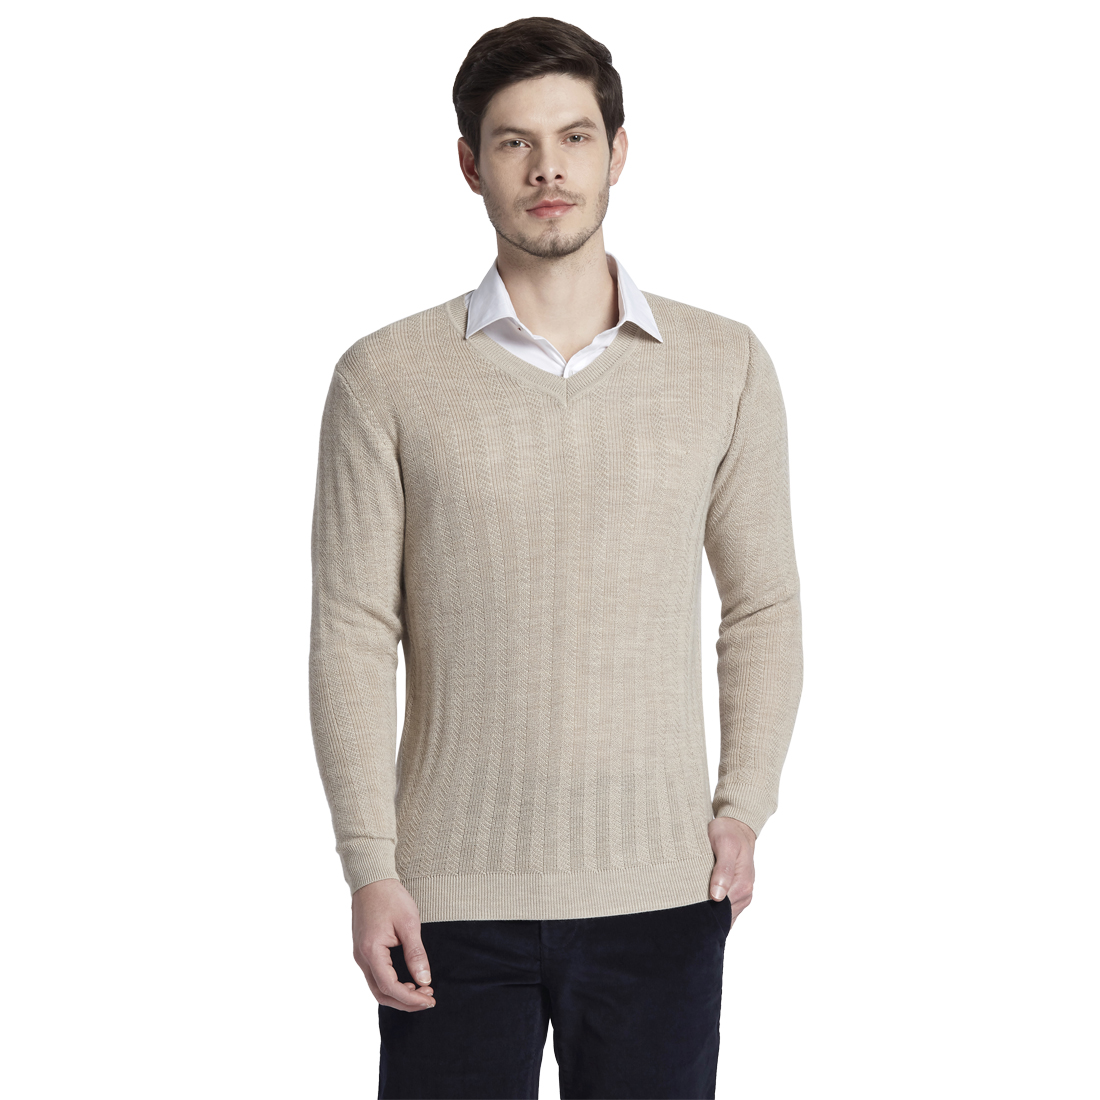 ColorPlus | ColorPlus Beige Sweaters